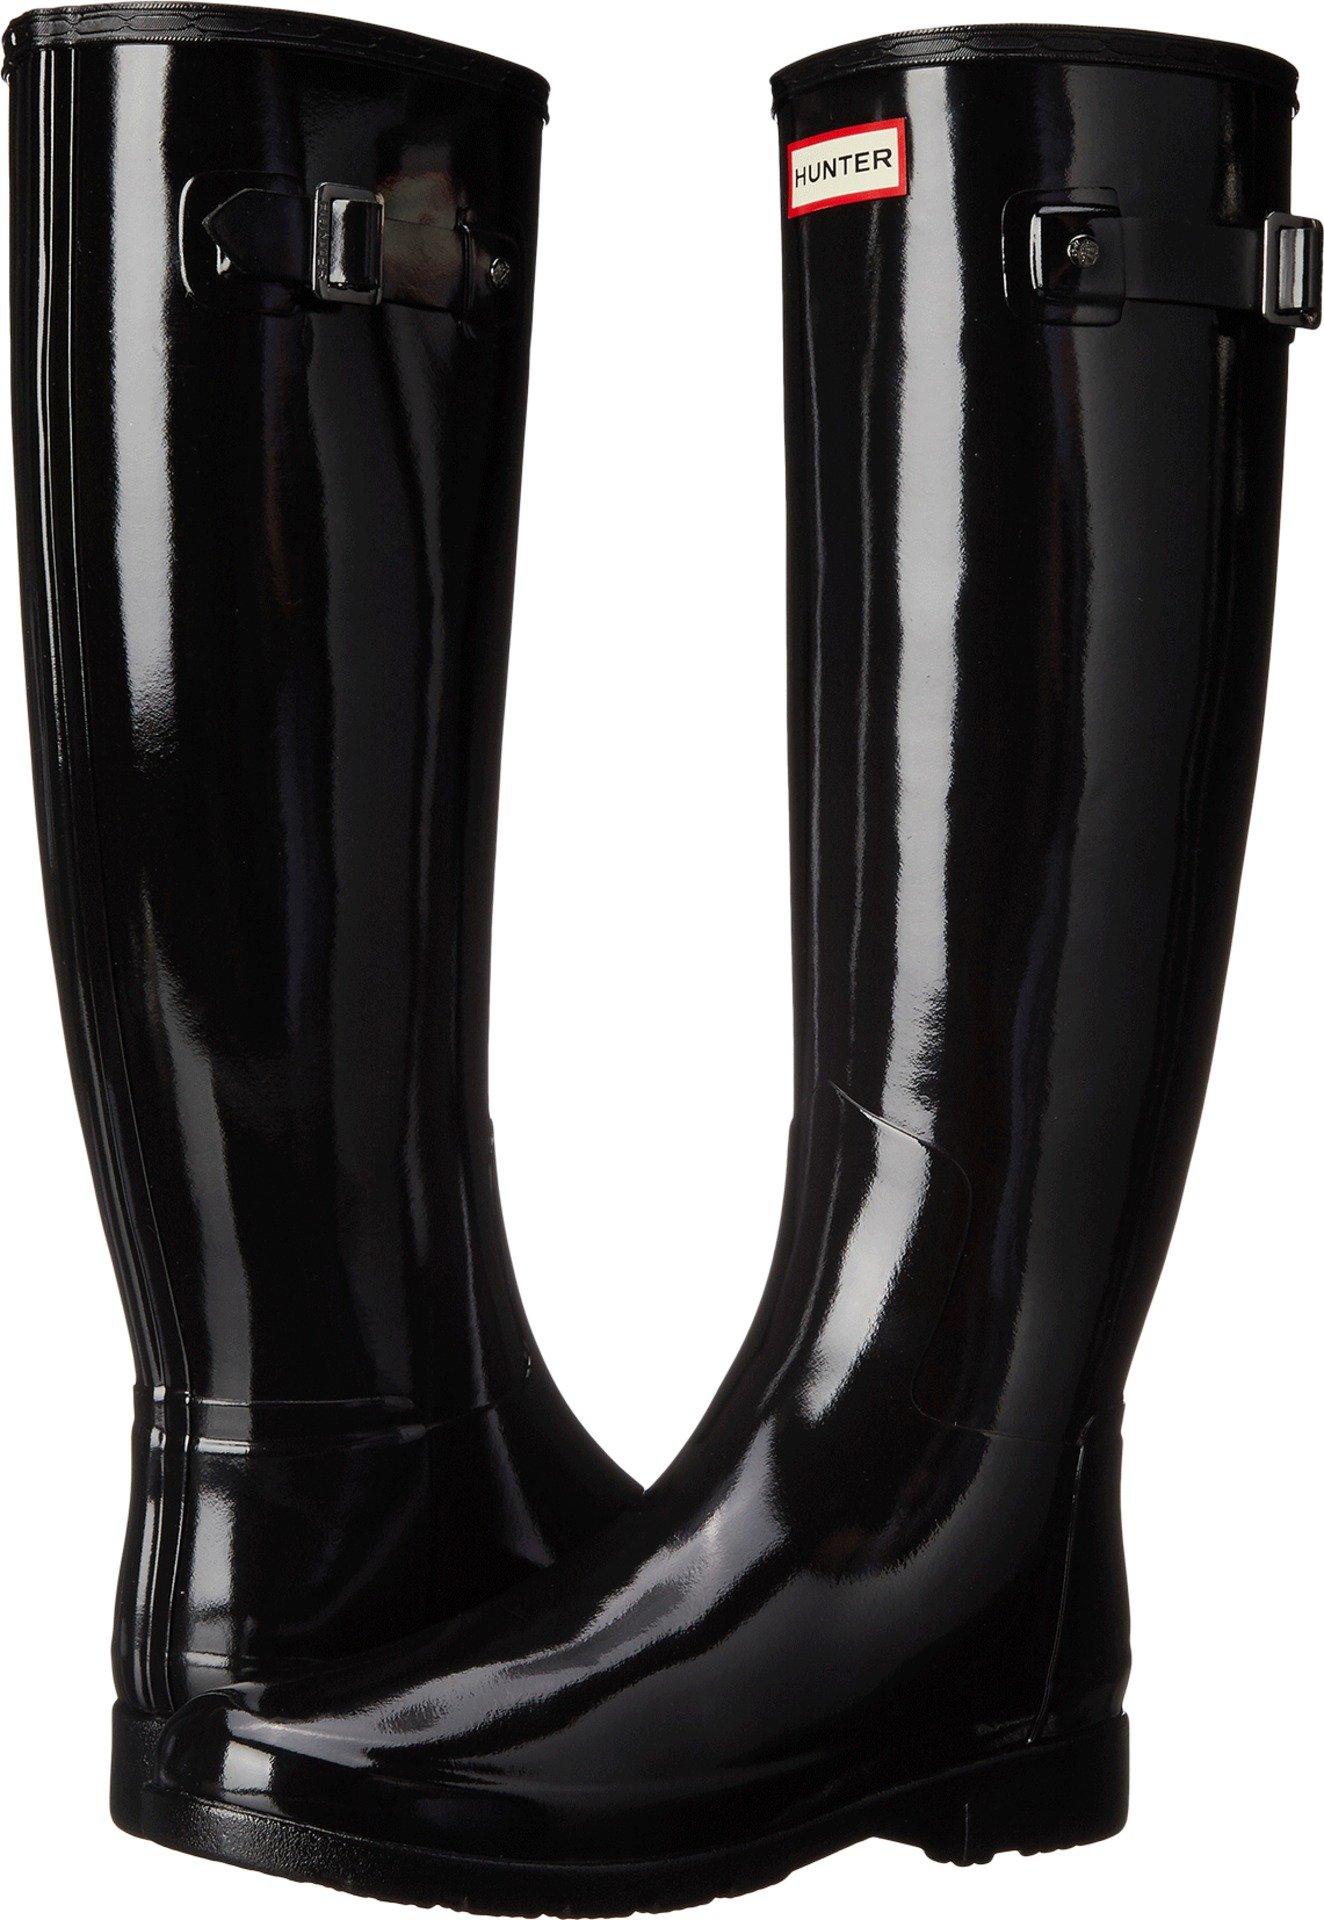 Hunter Women's Original Refined Gloss Rain Boots Black 9 M US